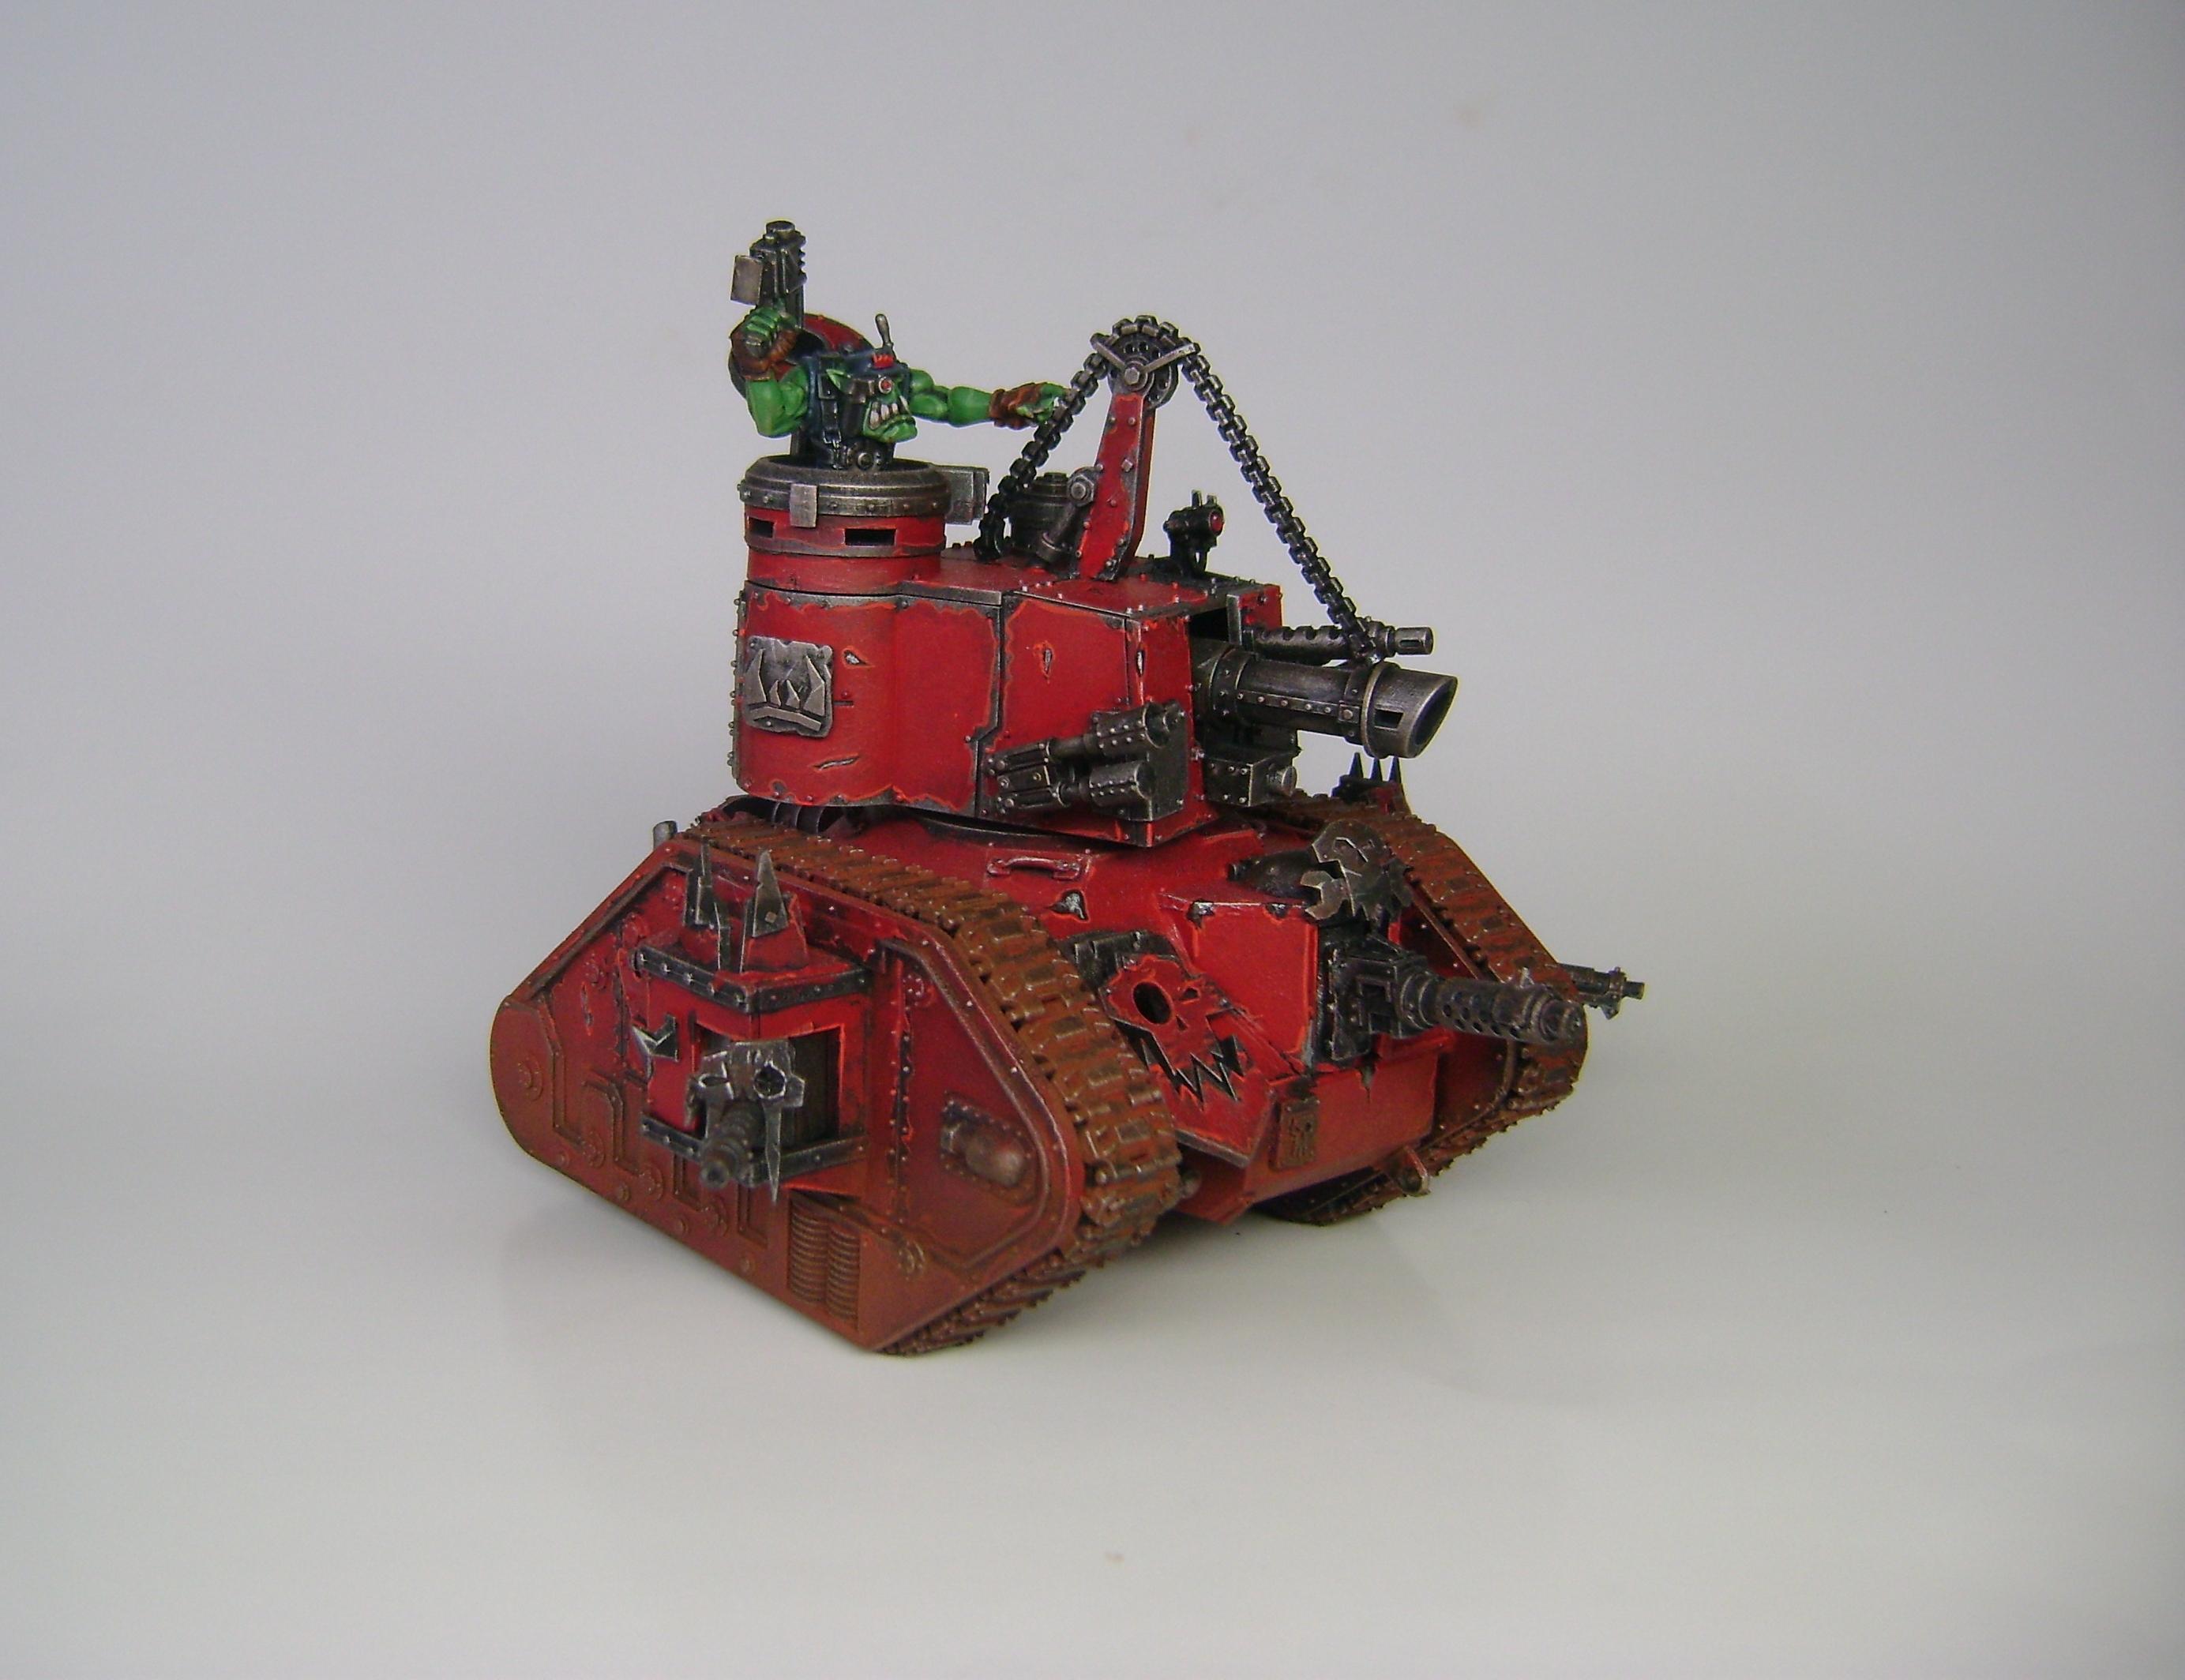 Lotted battle truck mk 2